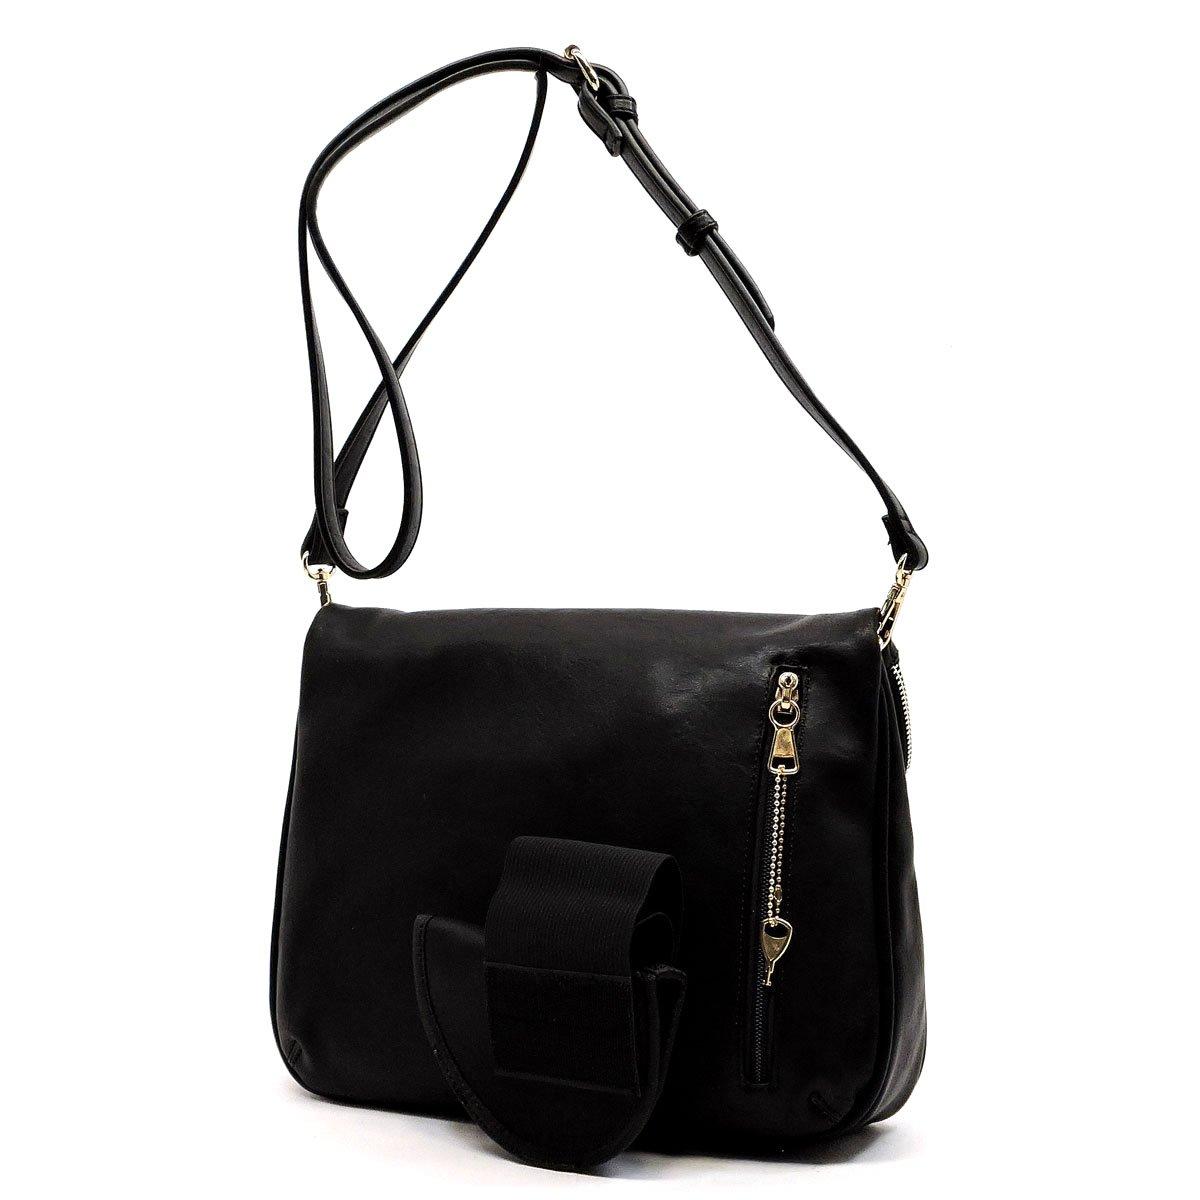 Concealed Carry Purse - Daisy Lock Concealed Carry Messanger Bag- Black   Handbags  Amazon.com f785b9c52331e